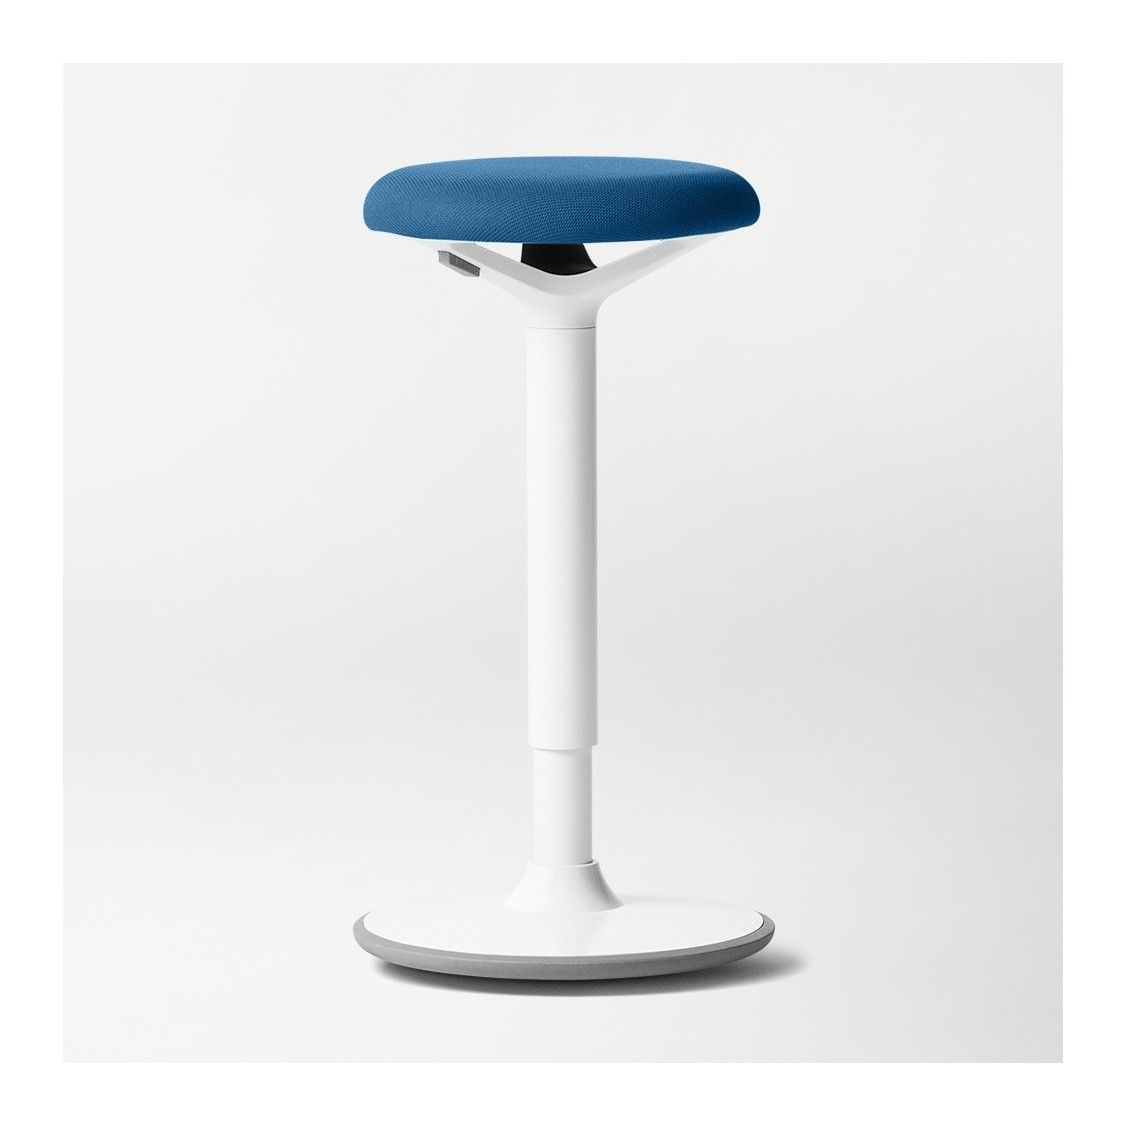 Luna Standing Desk Stool Stand Stool Desk Stool Stool